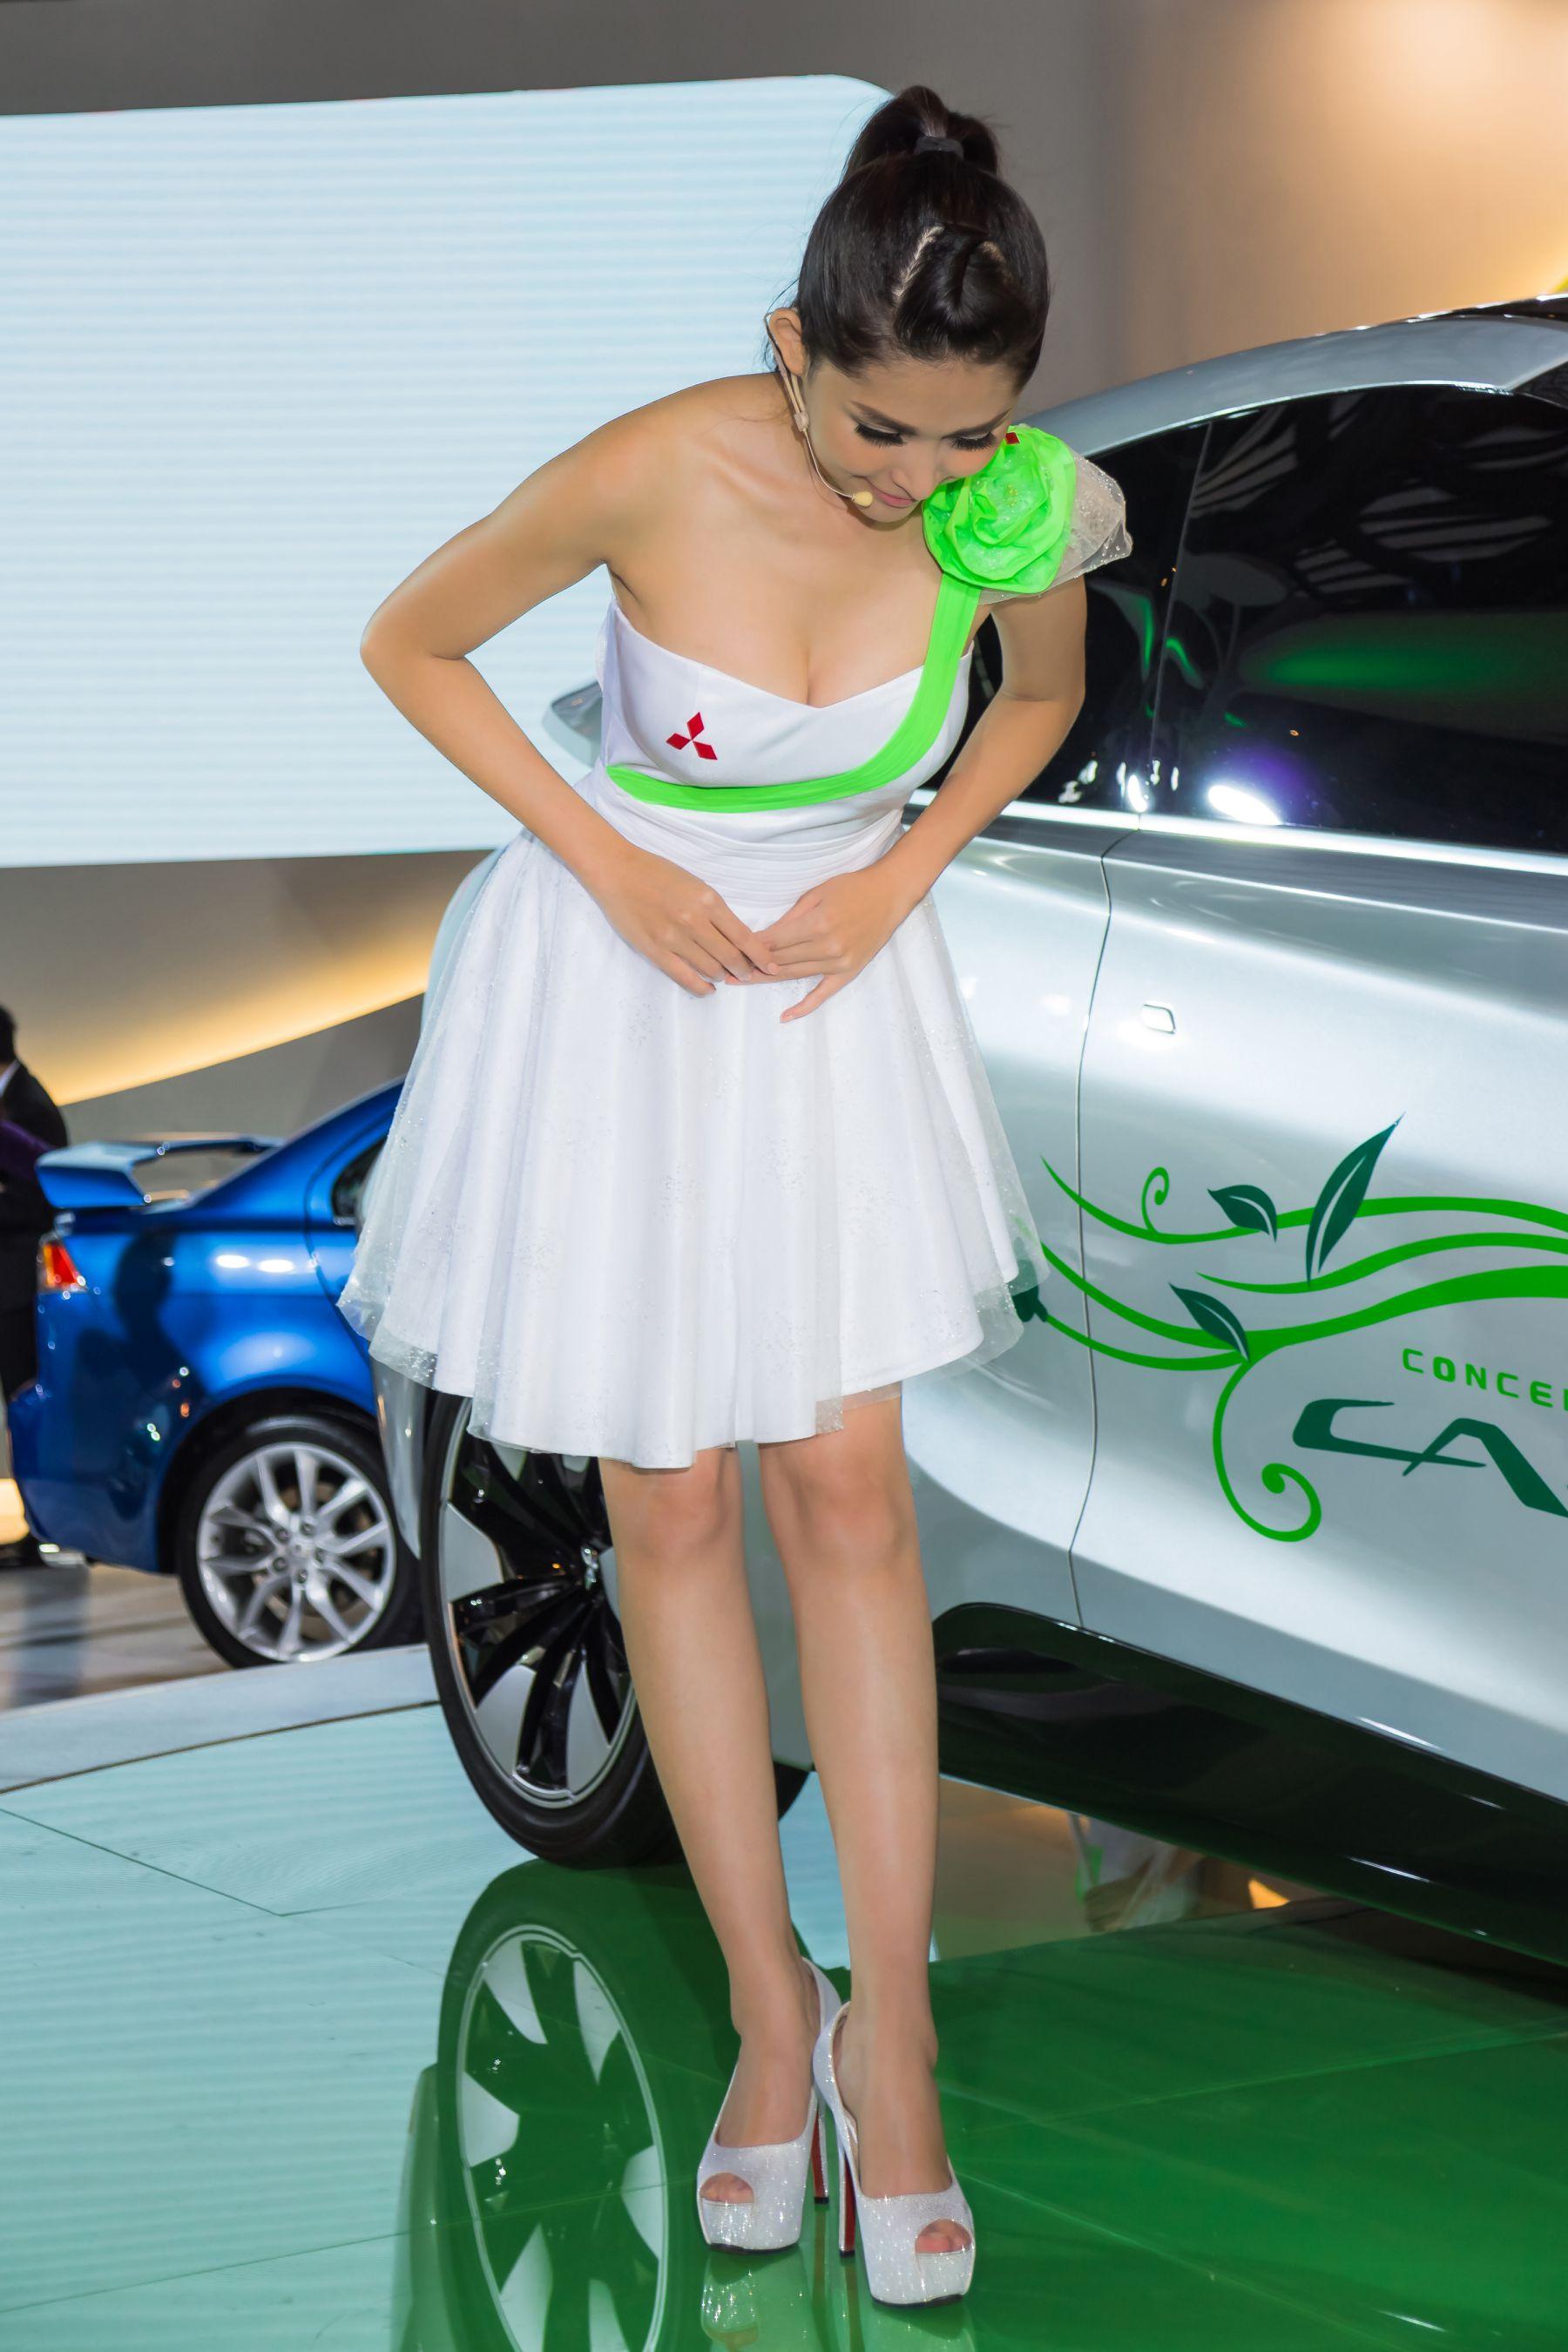 VOL.410 [台湾正妹]Show Girl车模:杜可薇(腿模Avy,恬小鱼)高品质写真套图(57P)